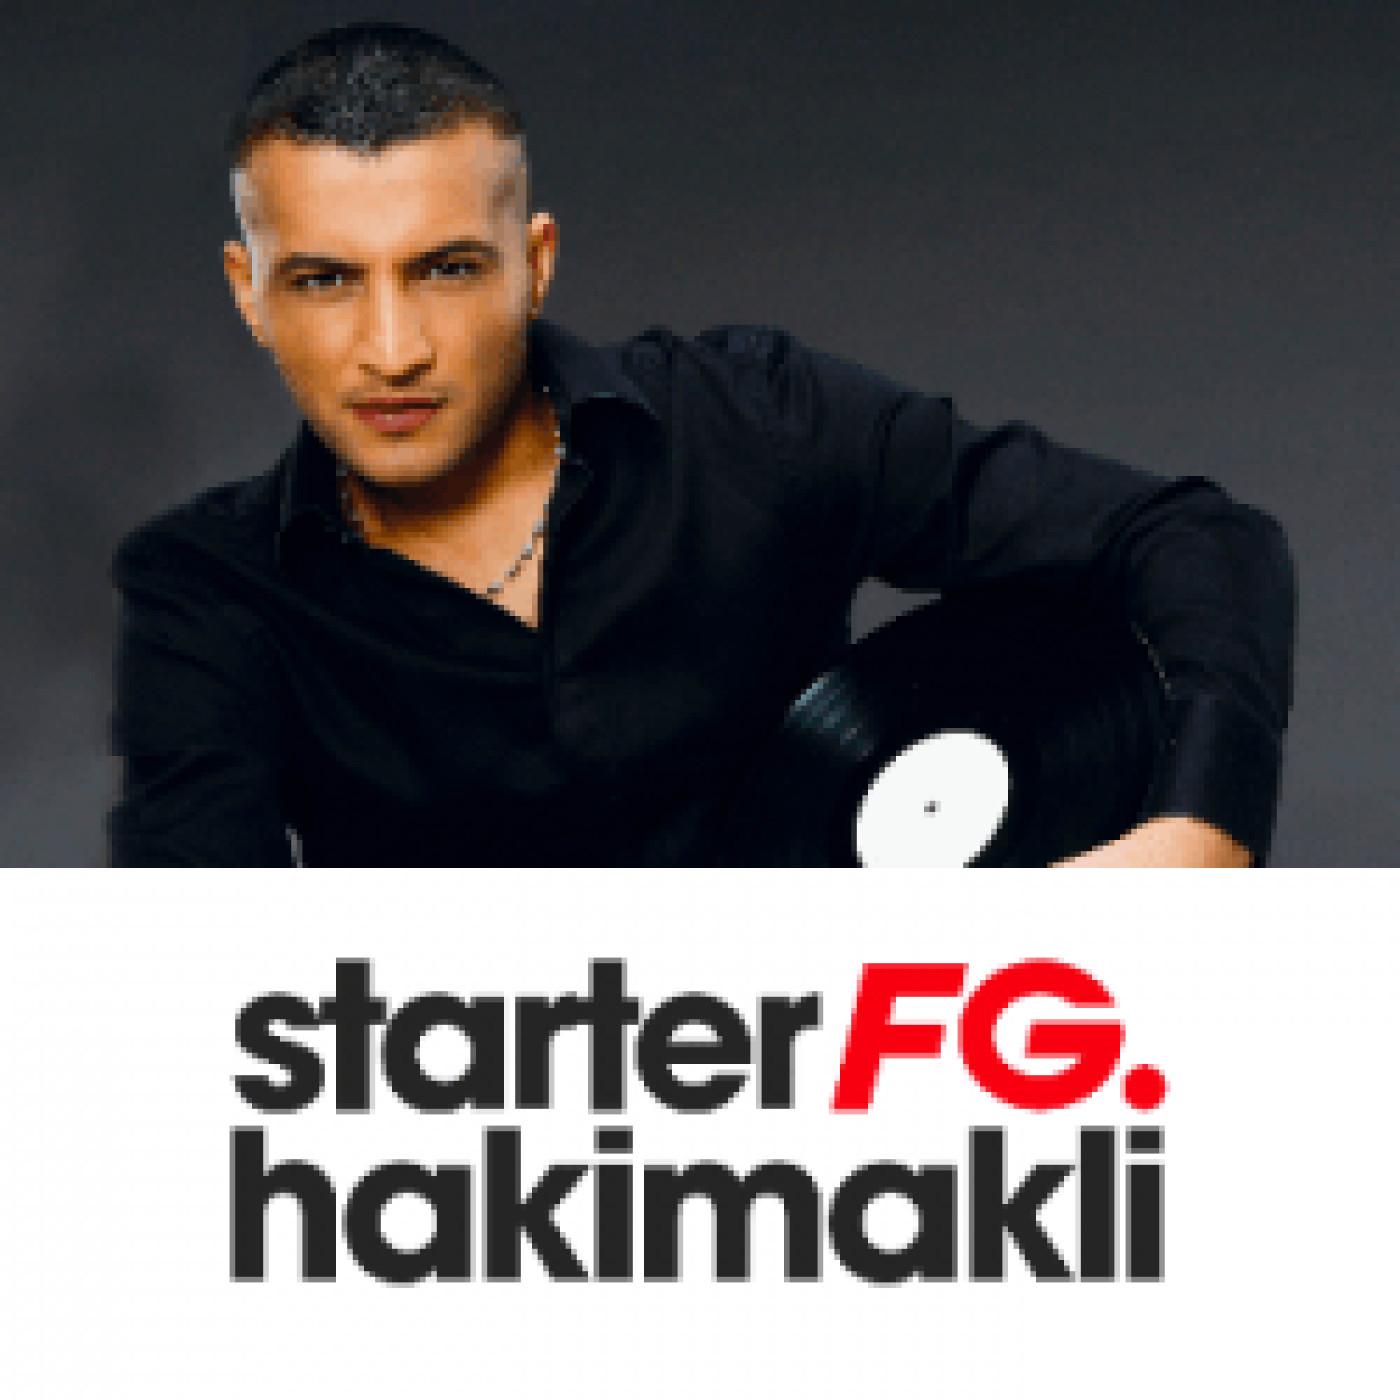 STARTER FG BY HAKIMAKLI MARDI 12 JANVIER 2021